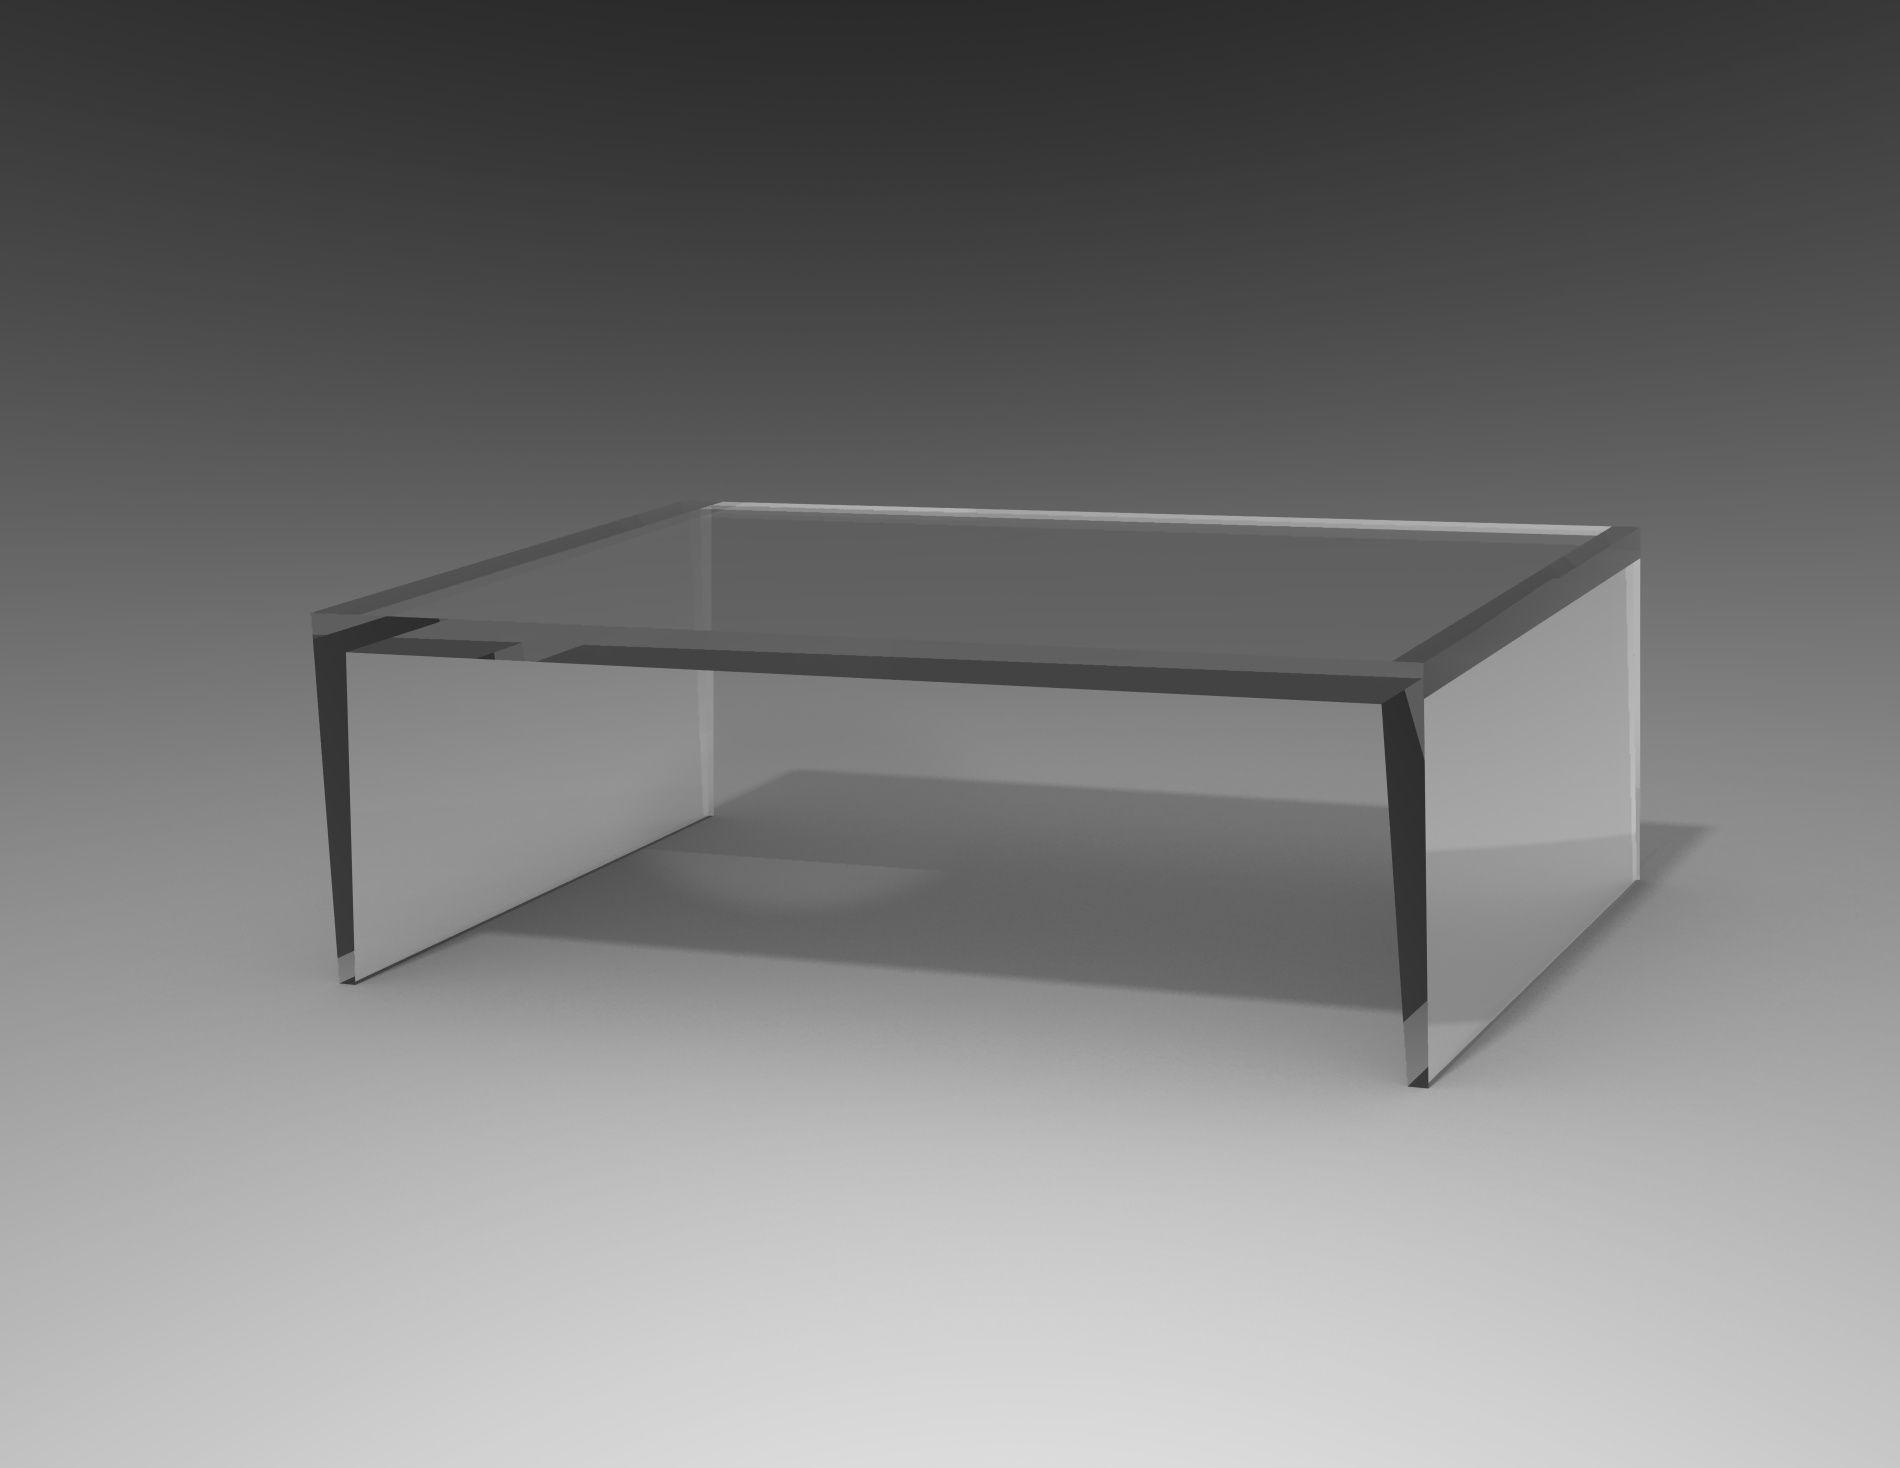 Carewjones Co Uk Razor Coffee Table In 40mm Thick Clear